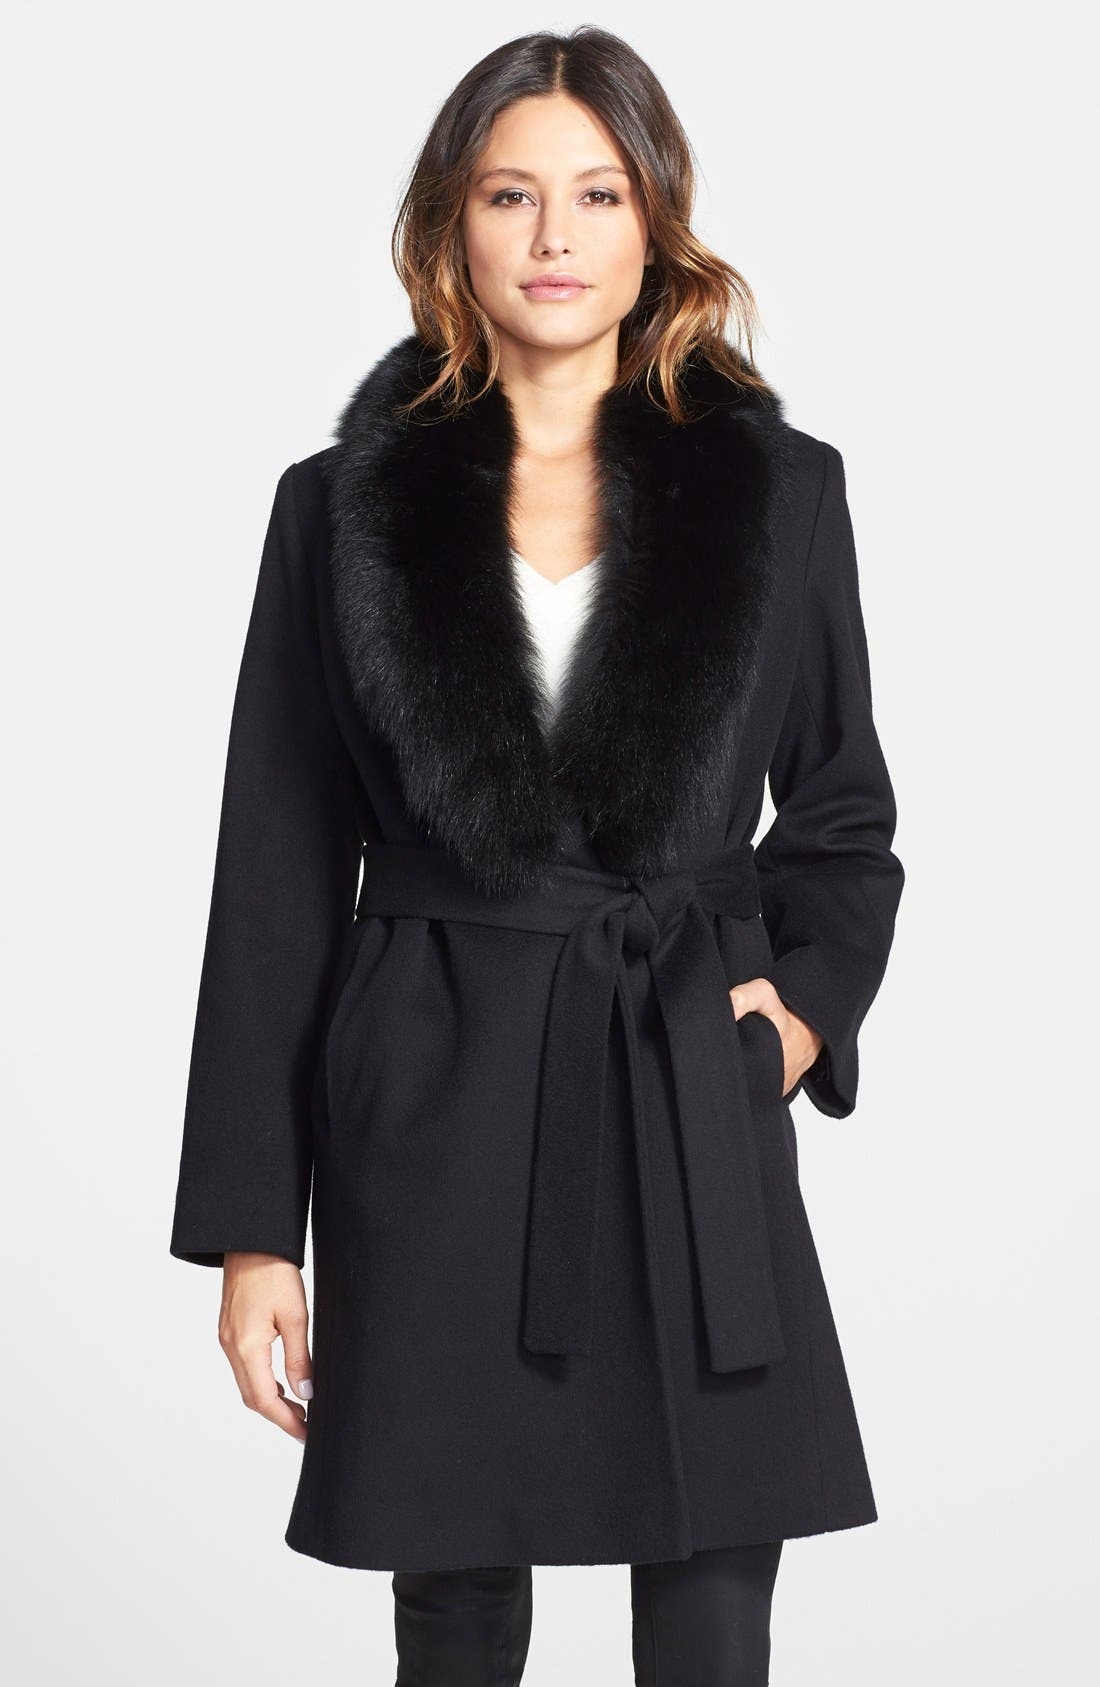 Alternate Image 1 Selected - Fleurette Wool Wrap Coat with Genuine Fox Fur Collar